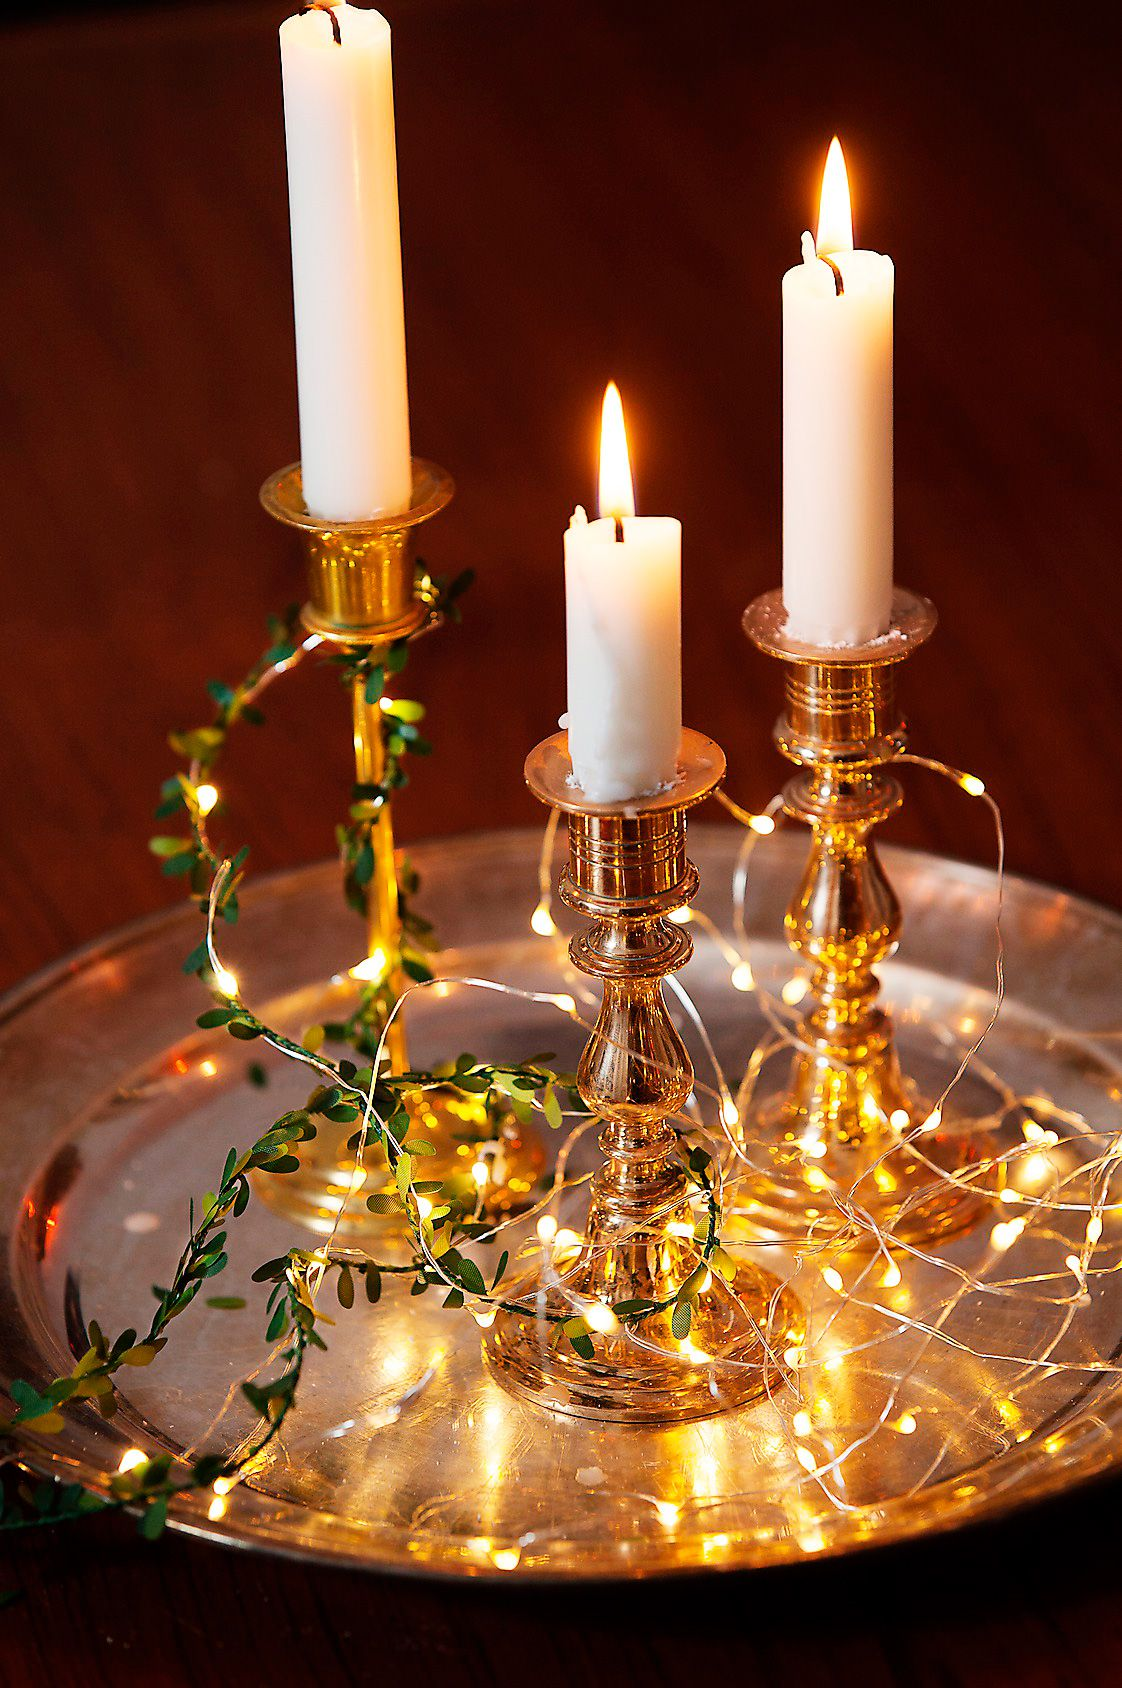 ljusslinga på bordet